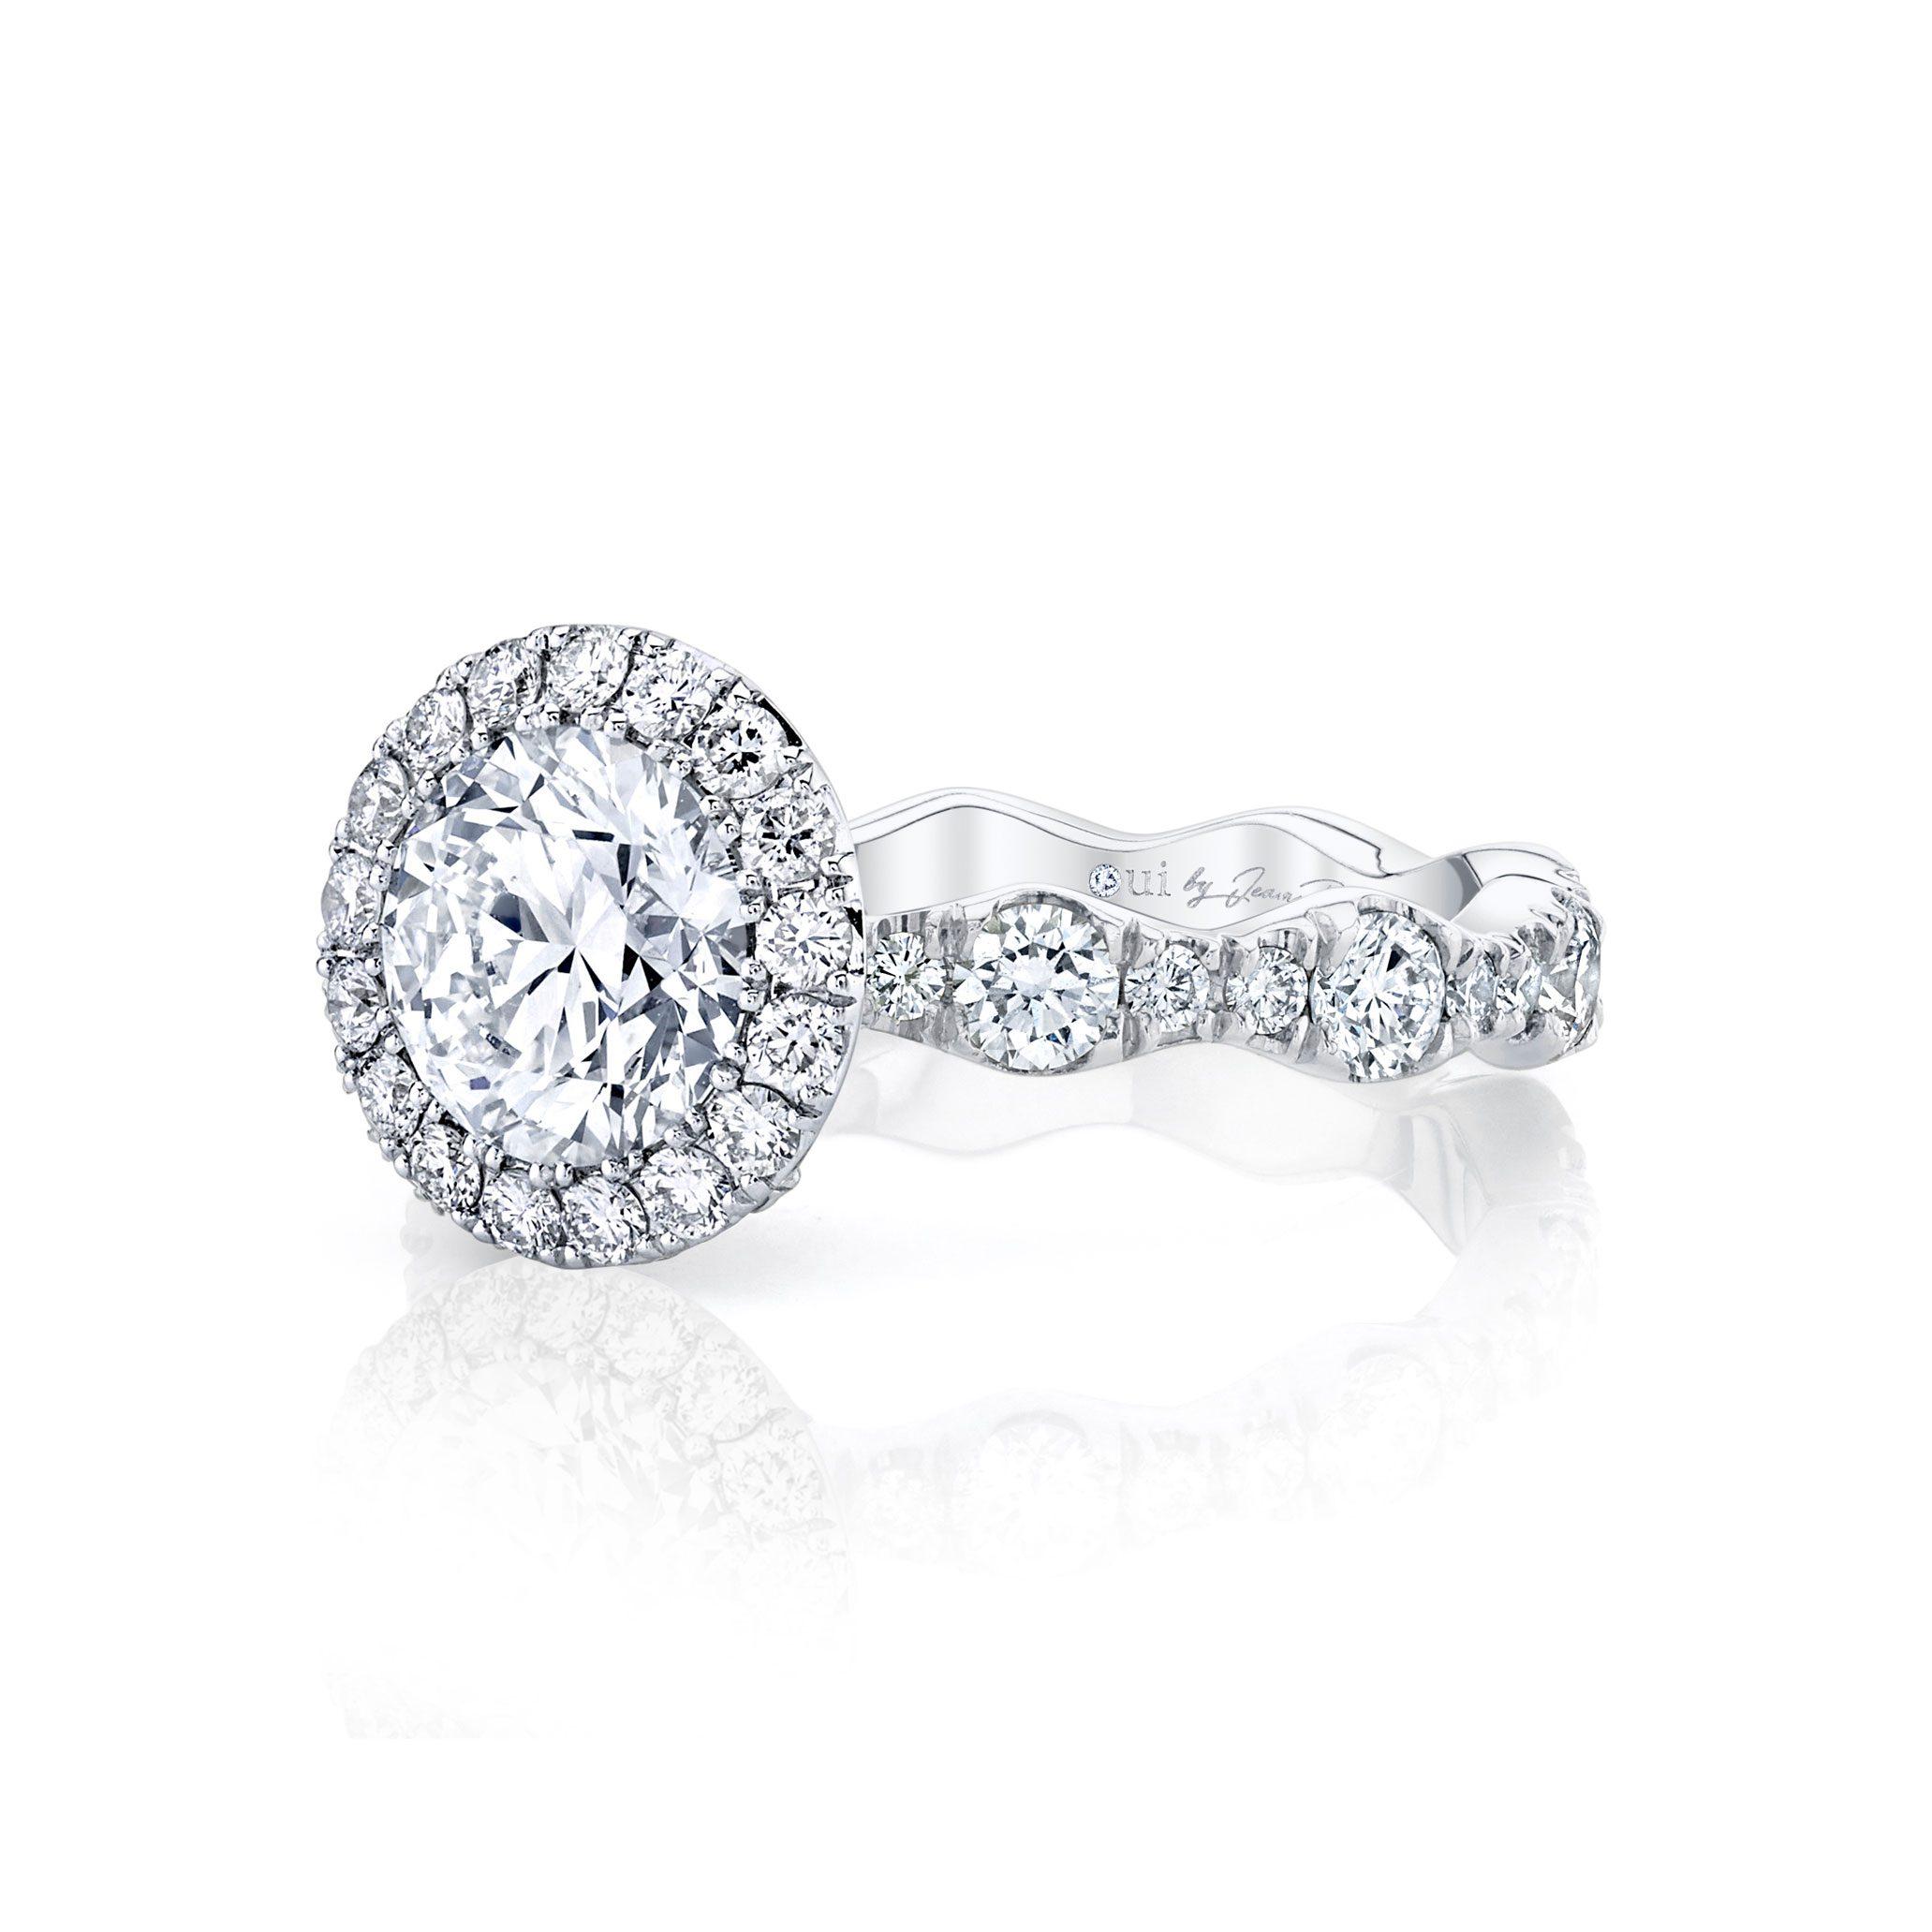 Yvonne Seamless Halo® Round Brilliant Engagement Ring 18k White Gold Side Shot